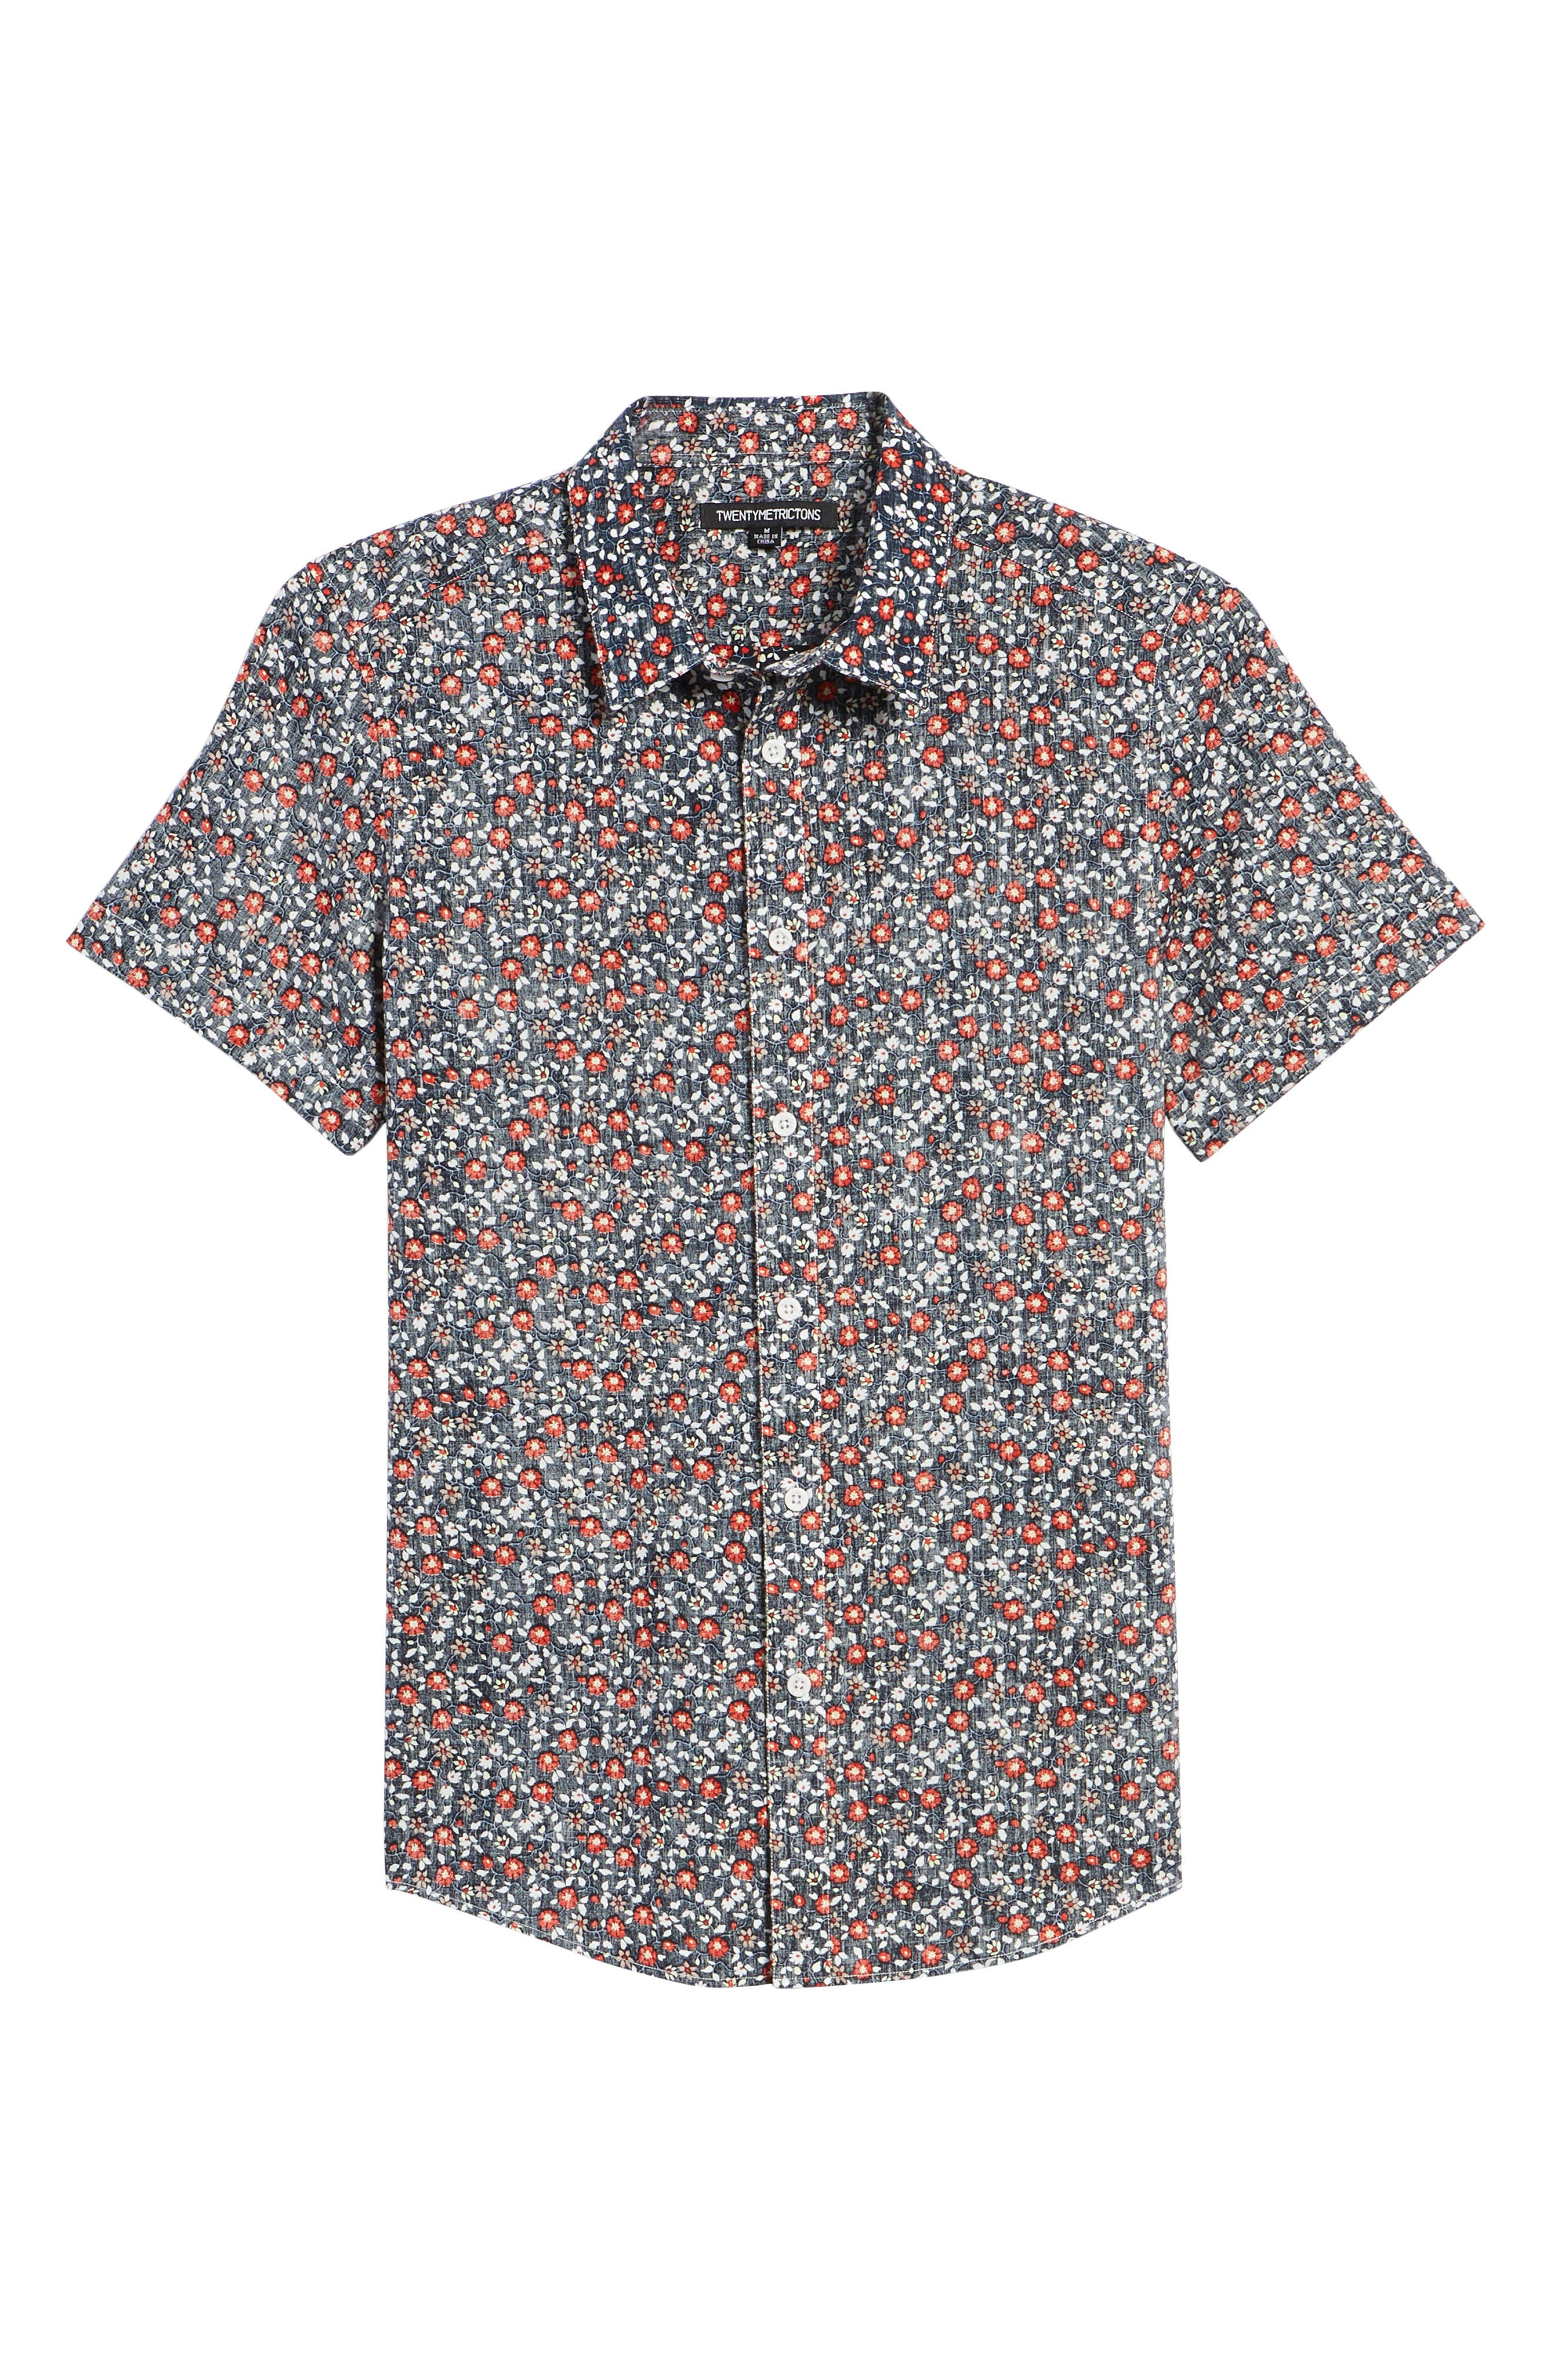 Trim Fit Print Woven Short Sleeve Shirt,                             Alternate thumbnail 6, color,                             Navy Floral